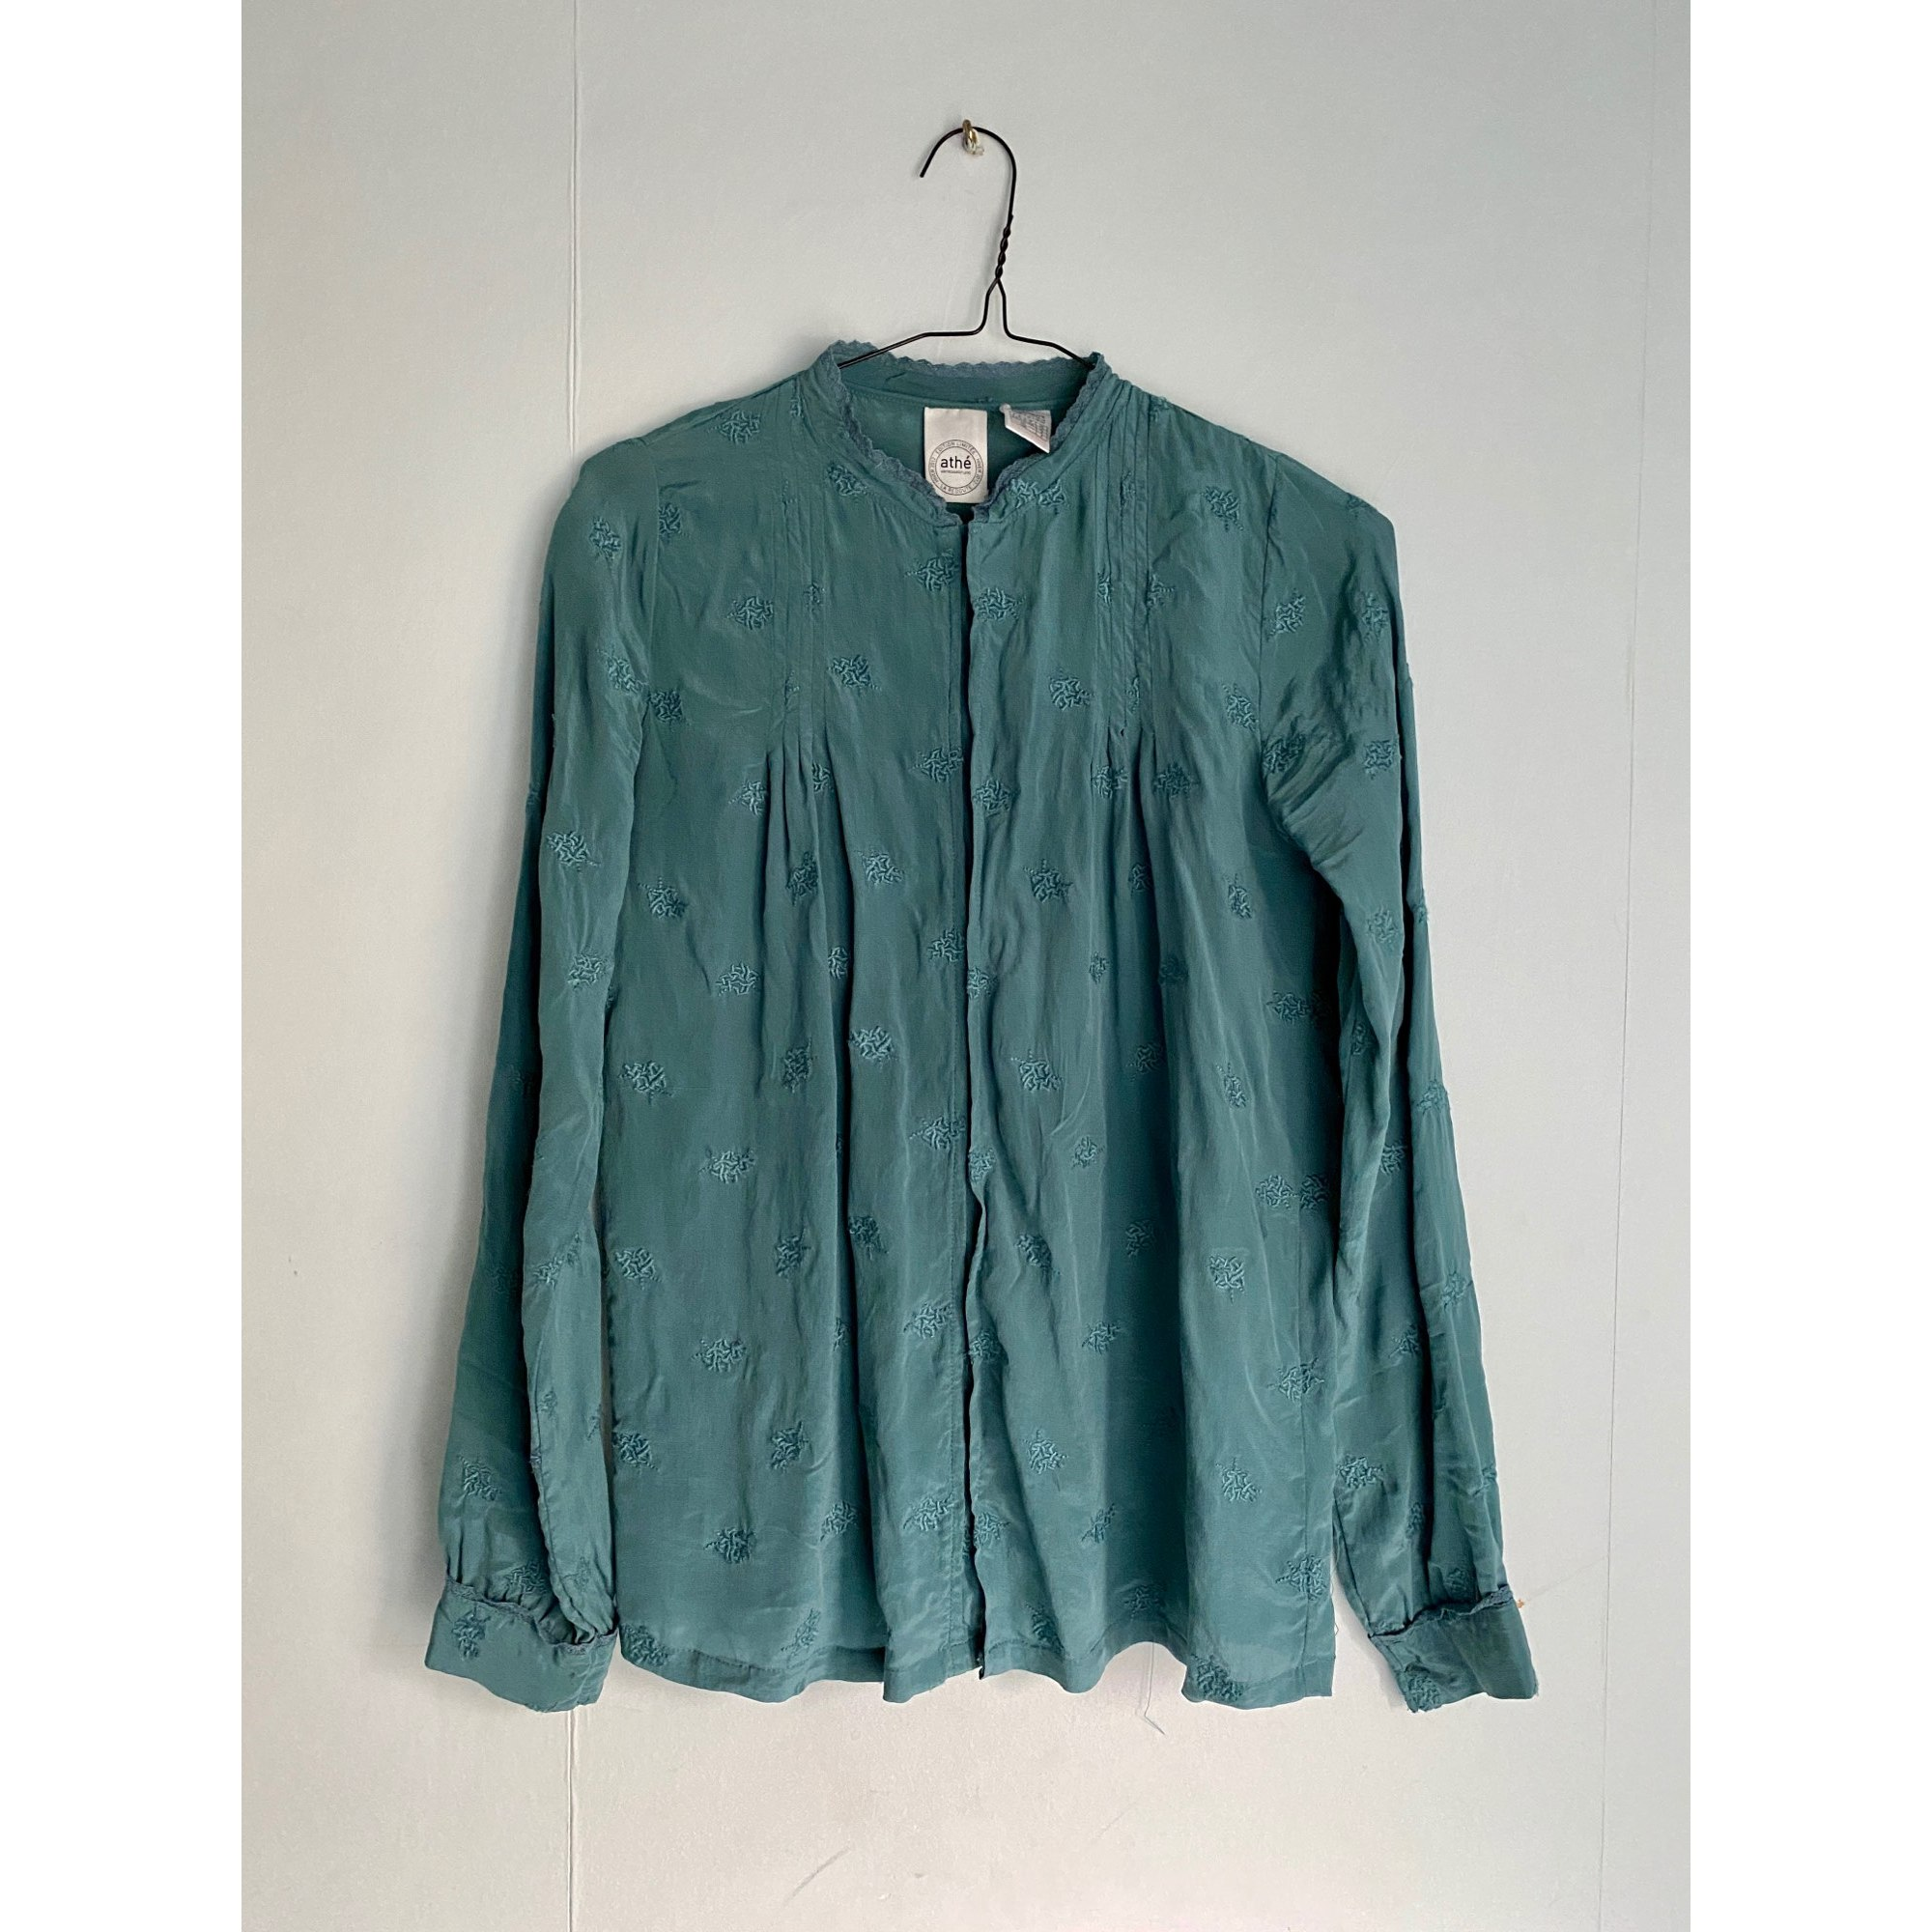 Blouse ATHÉ VANESSA BRUNO Bleu, bleu marine, bleu turquoise